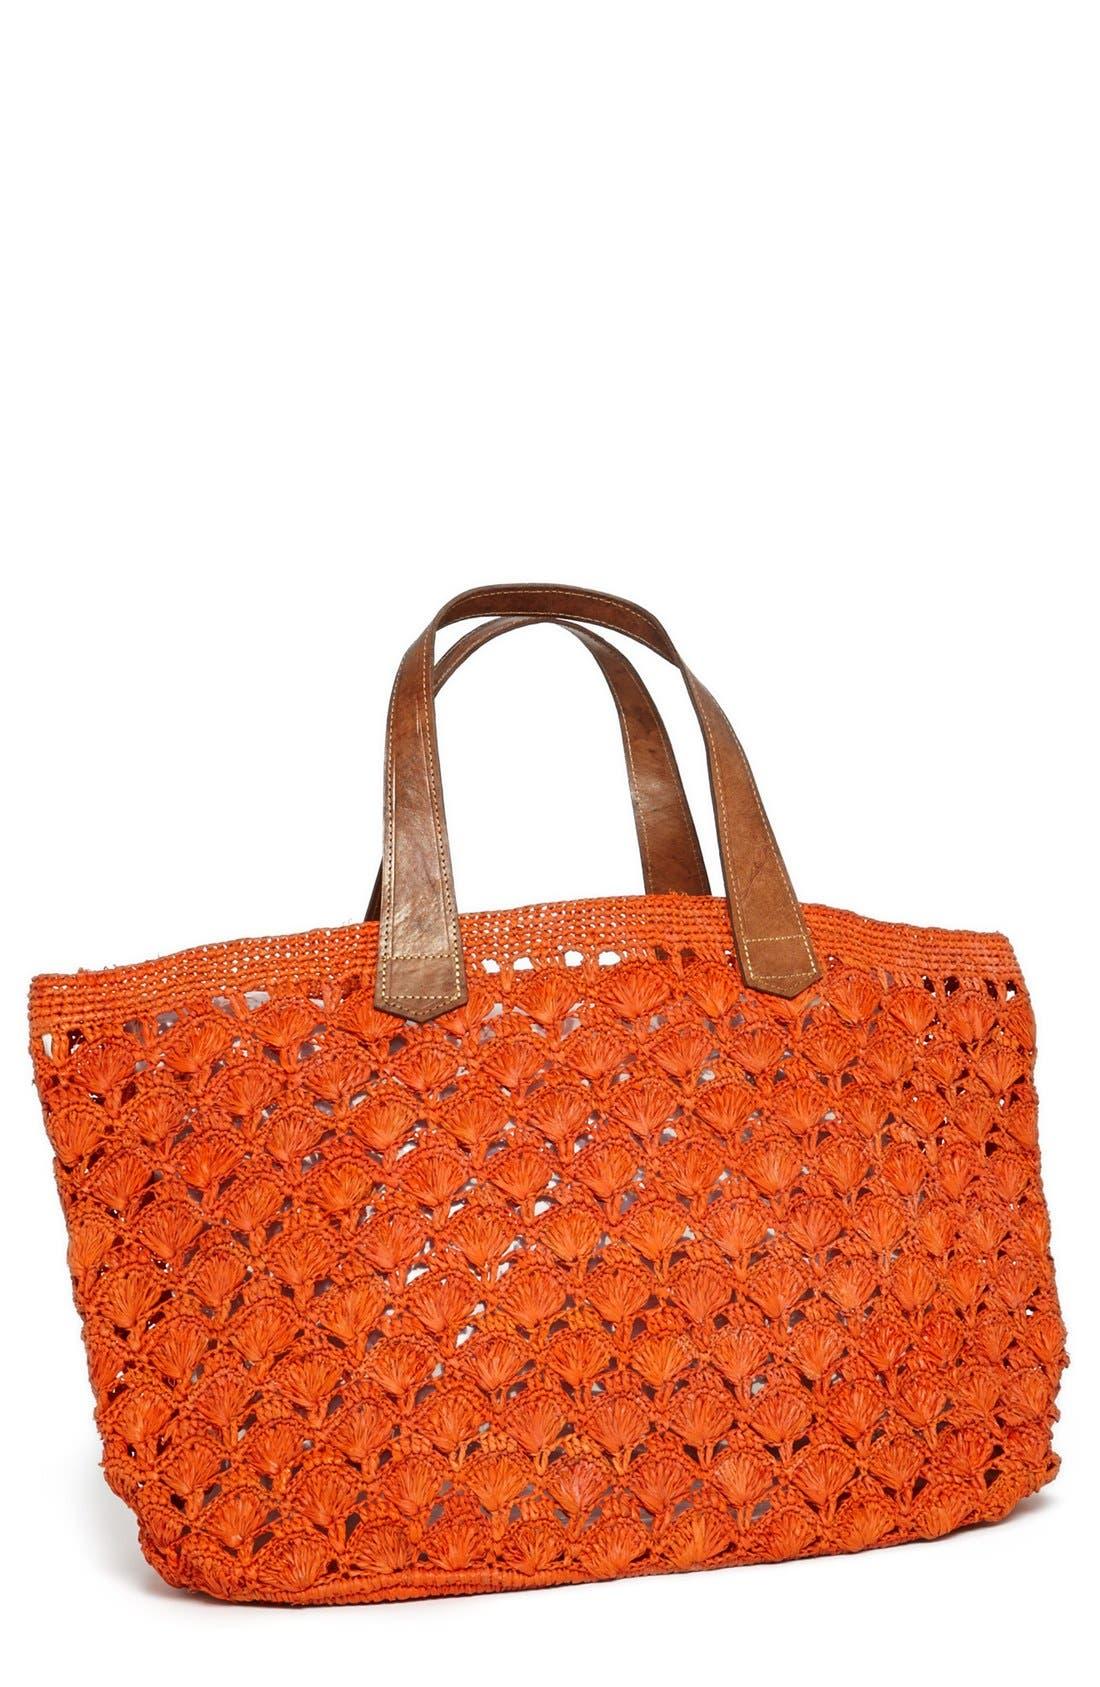 Main Image - Mar y Sol 'Valencia' Crocheted Raffia Tote